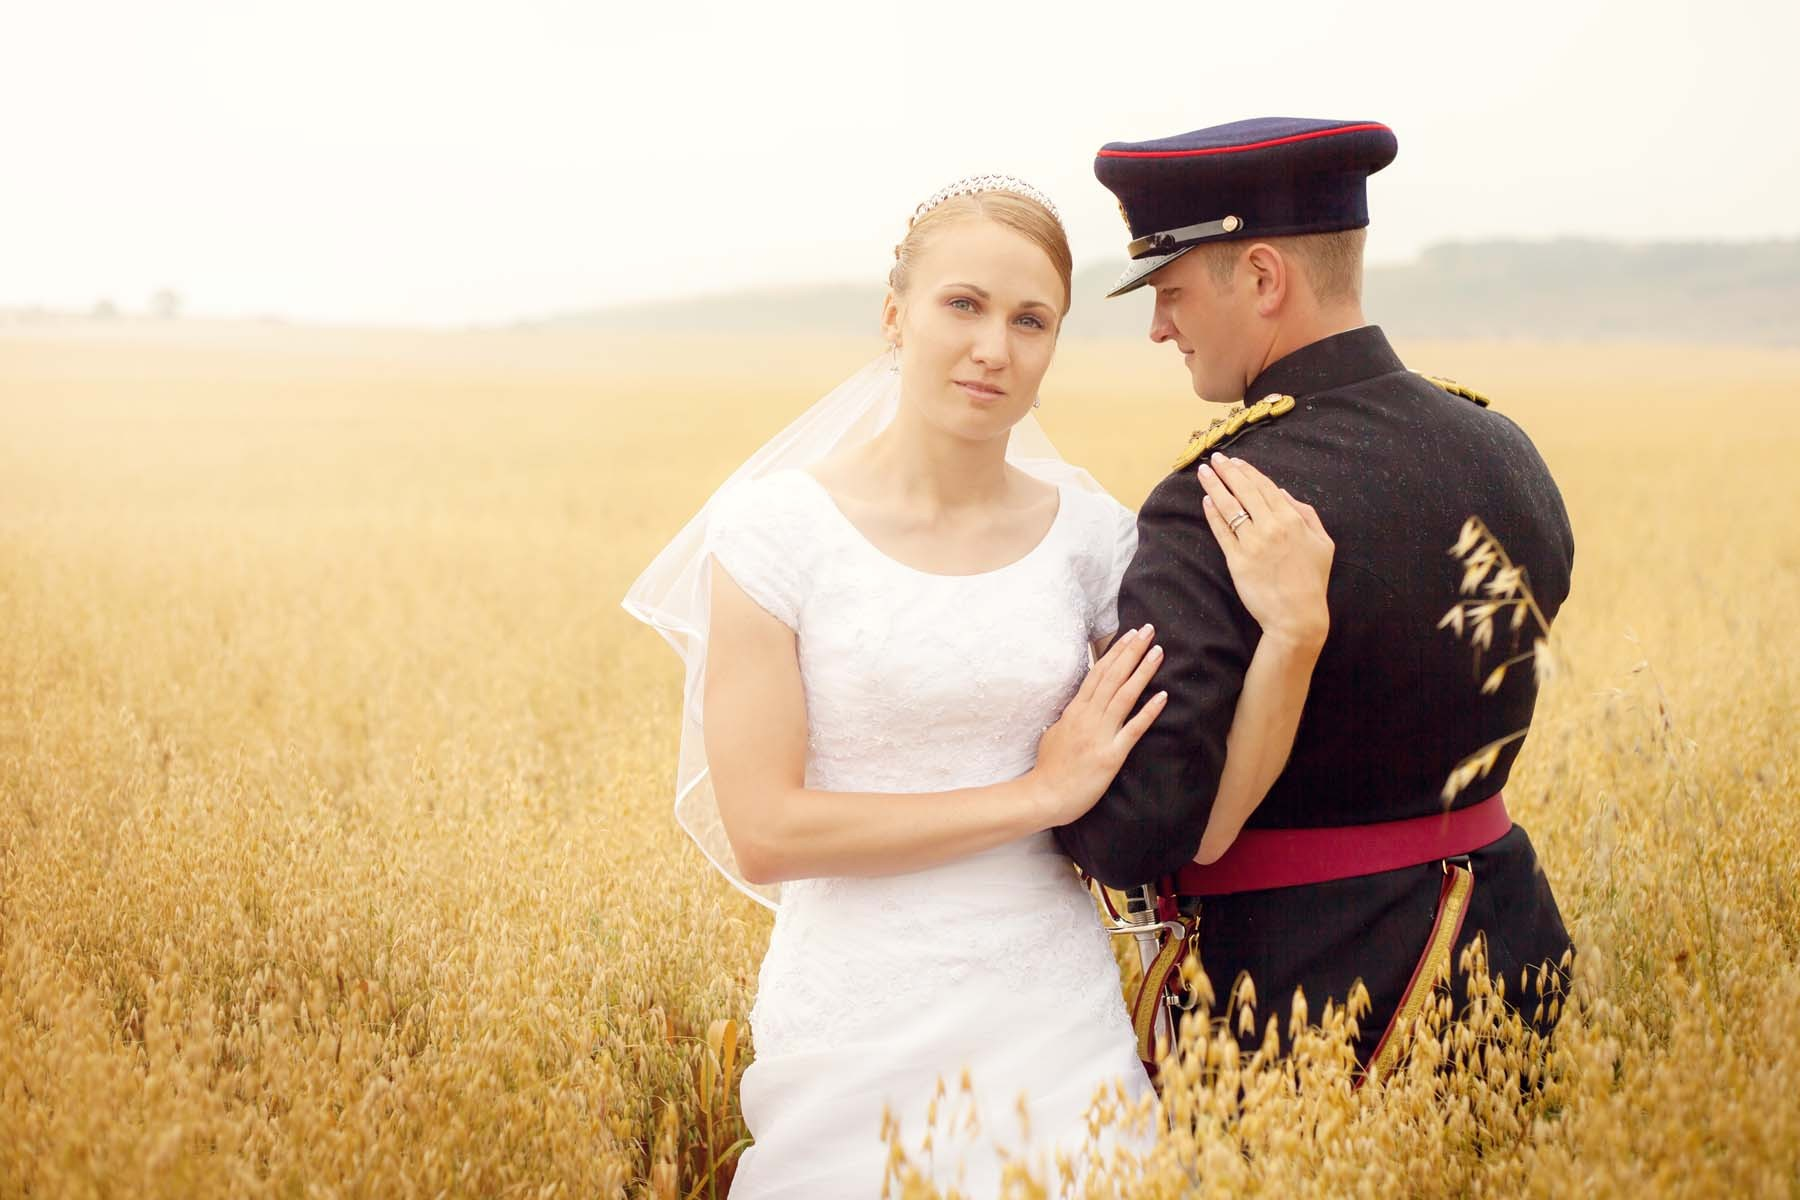 Sussex & Surrey Wedding Photographer - Bride & Groom (7)